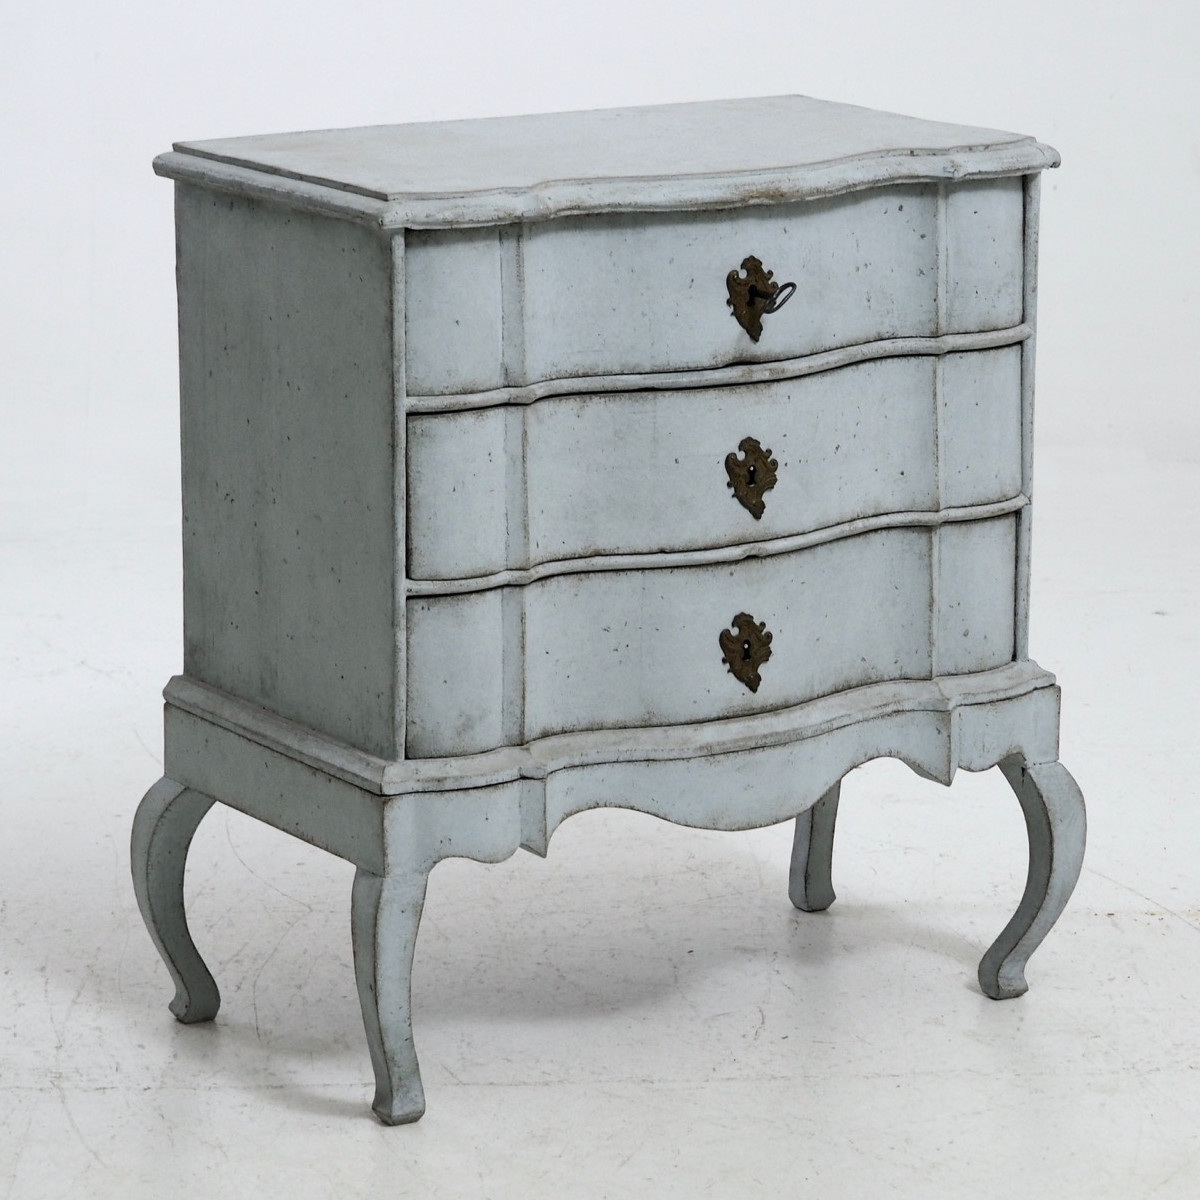 Scandinavian Rococo chest, 18th C. - € 1.600